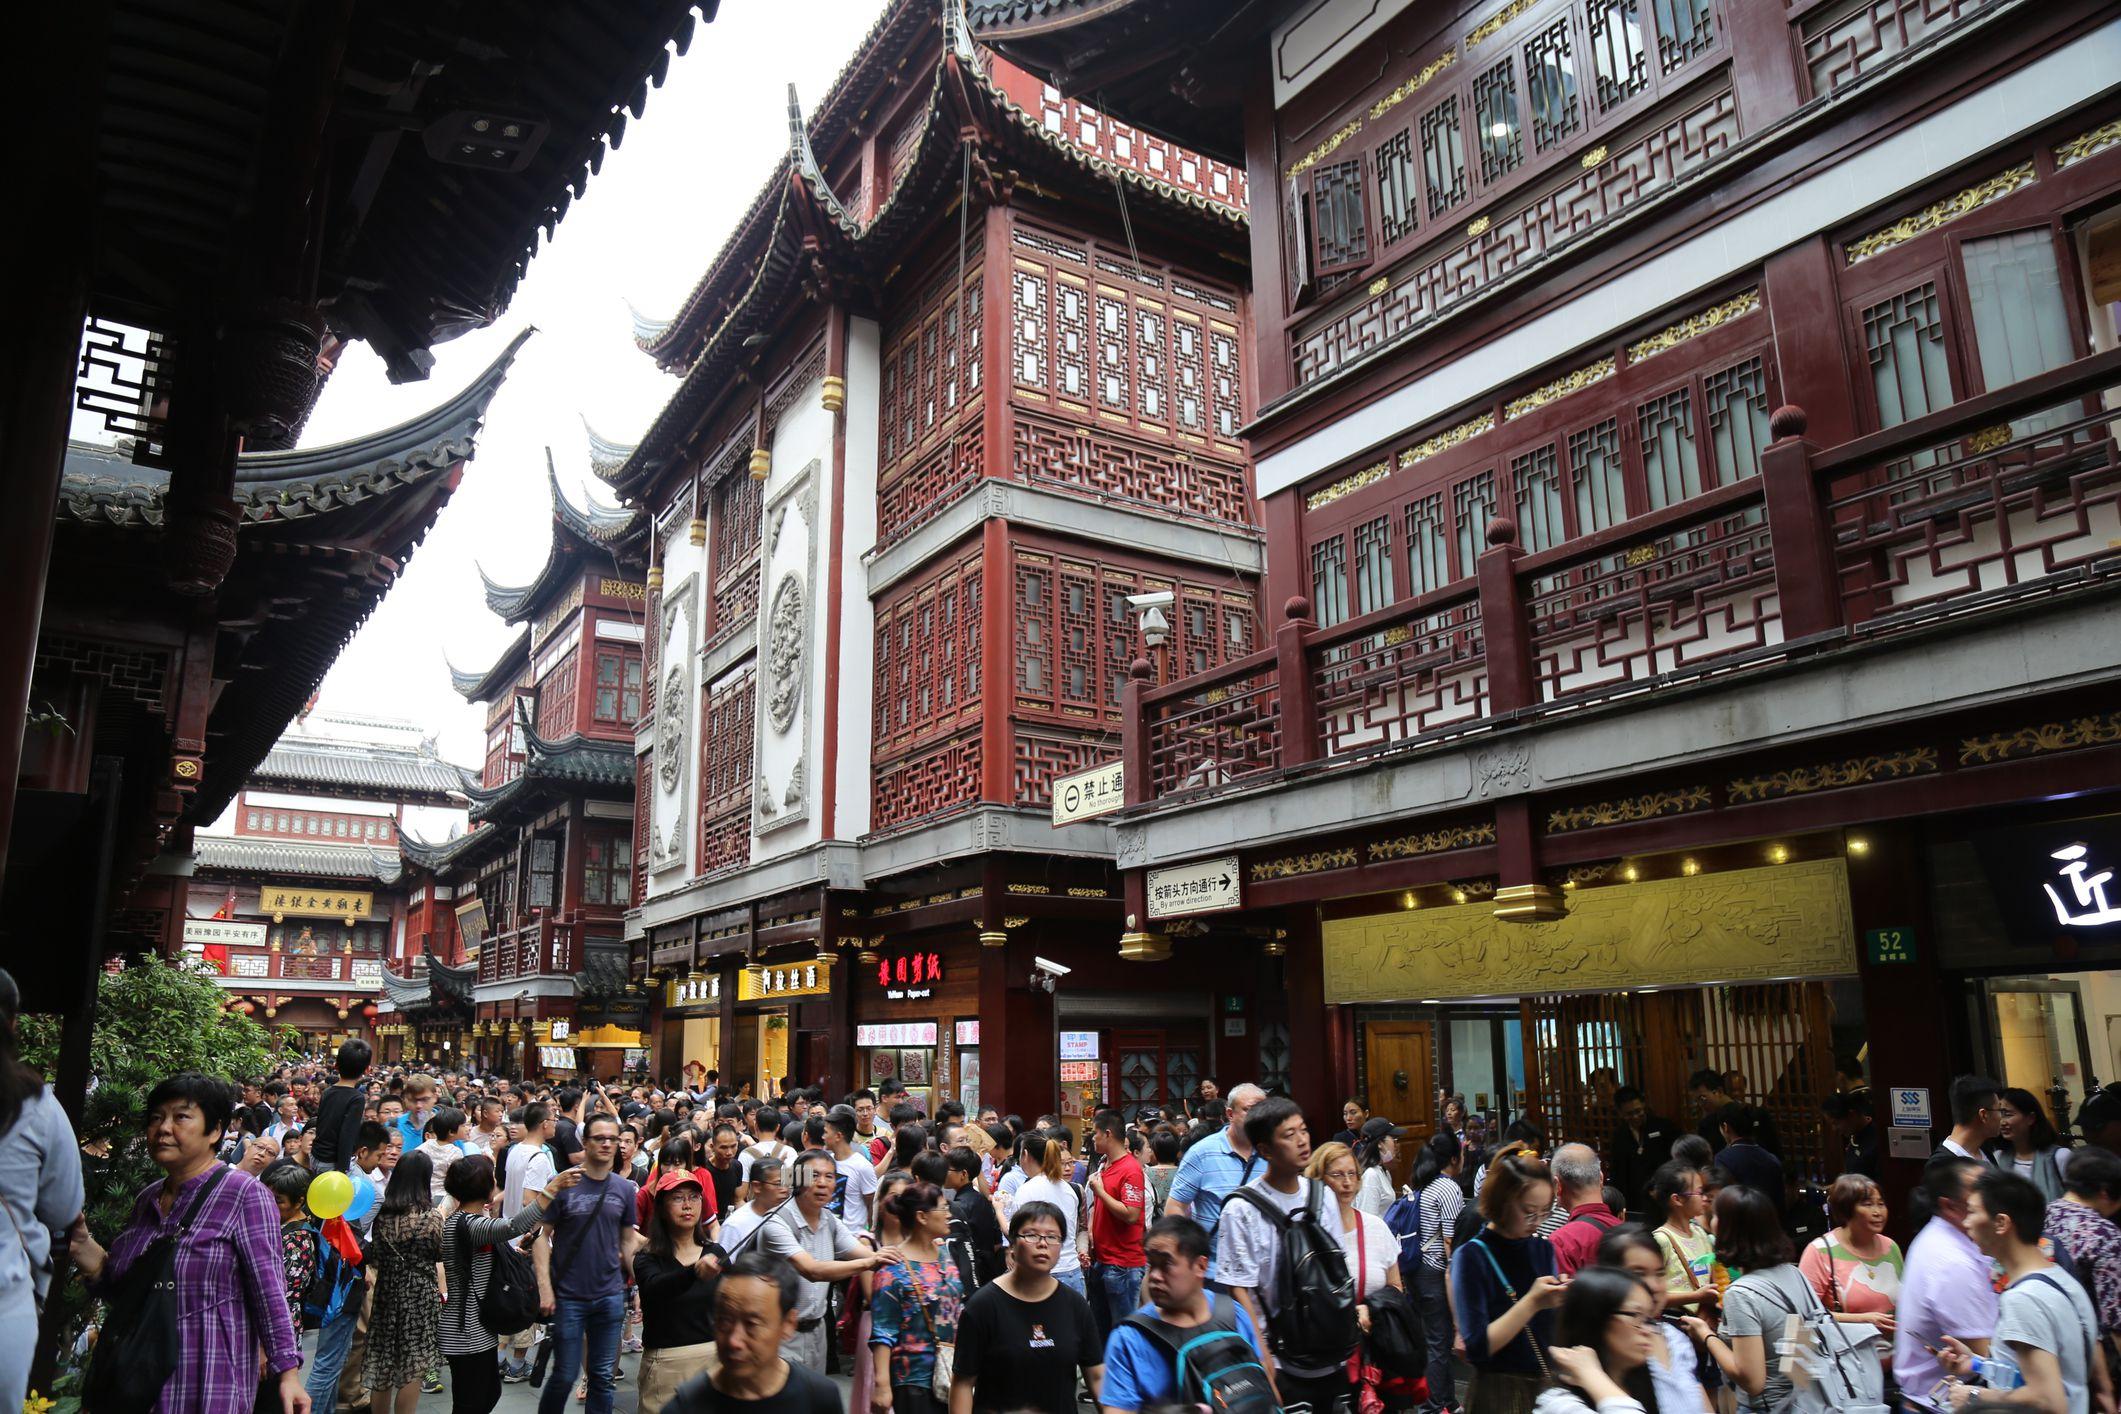 Shanghai Old City during Golden Week